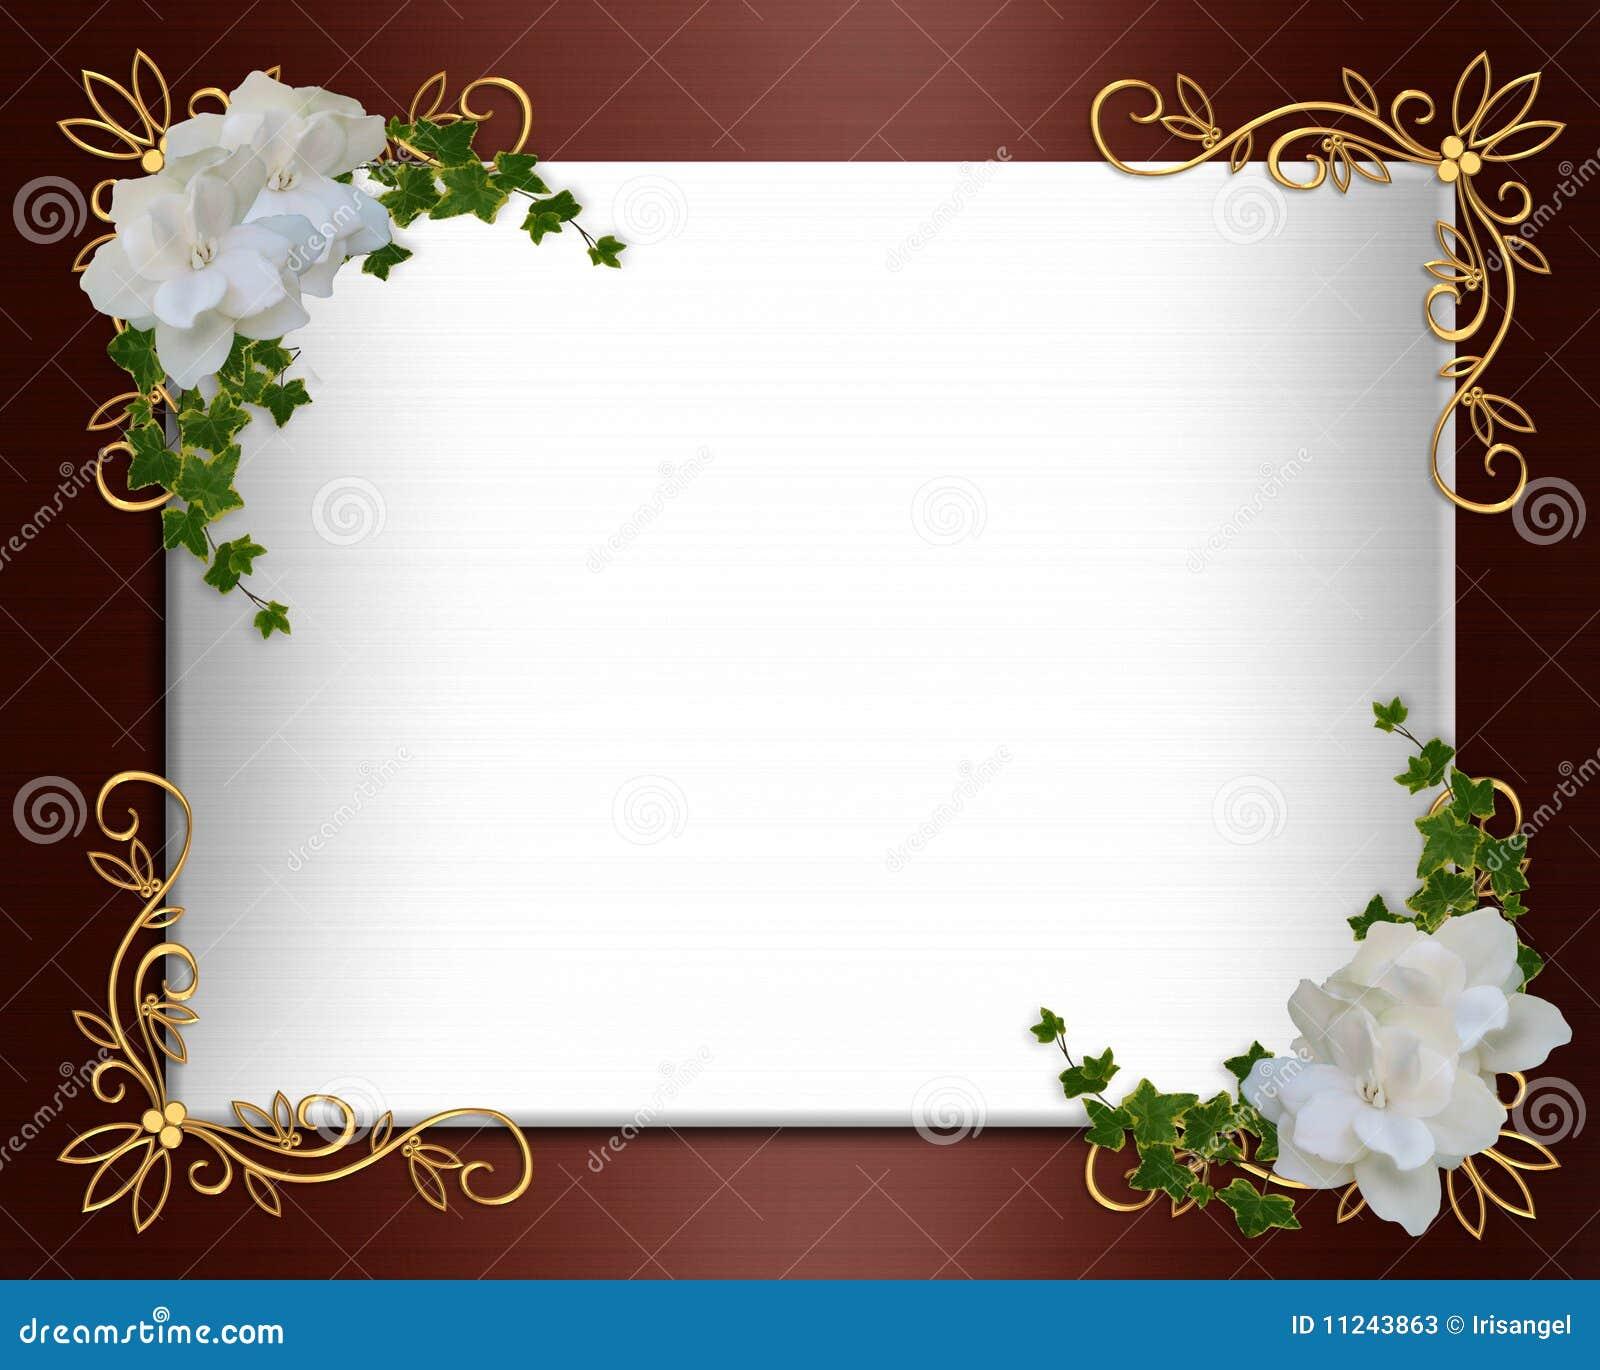 gold blank invitation template